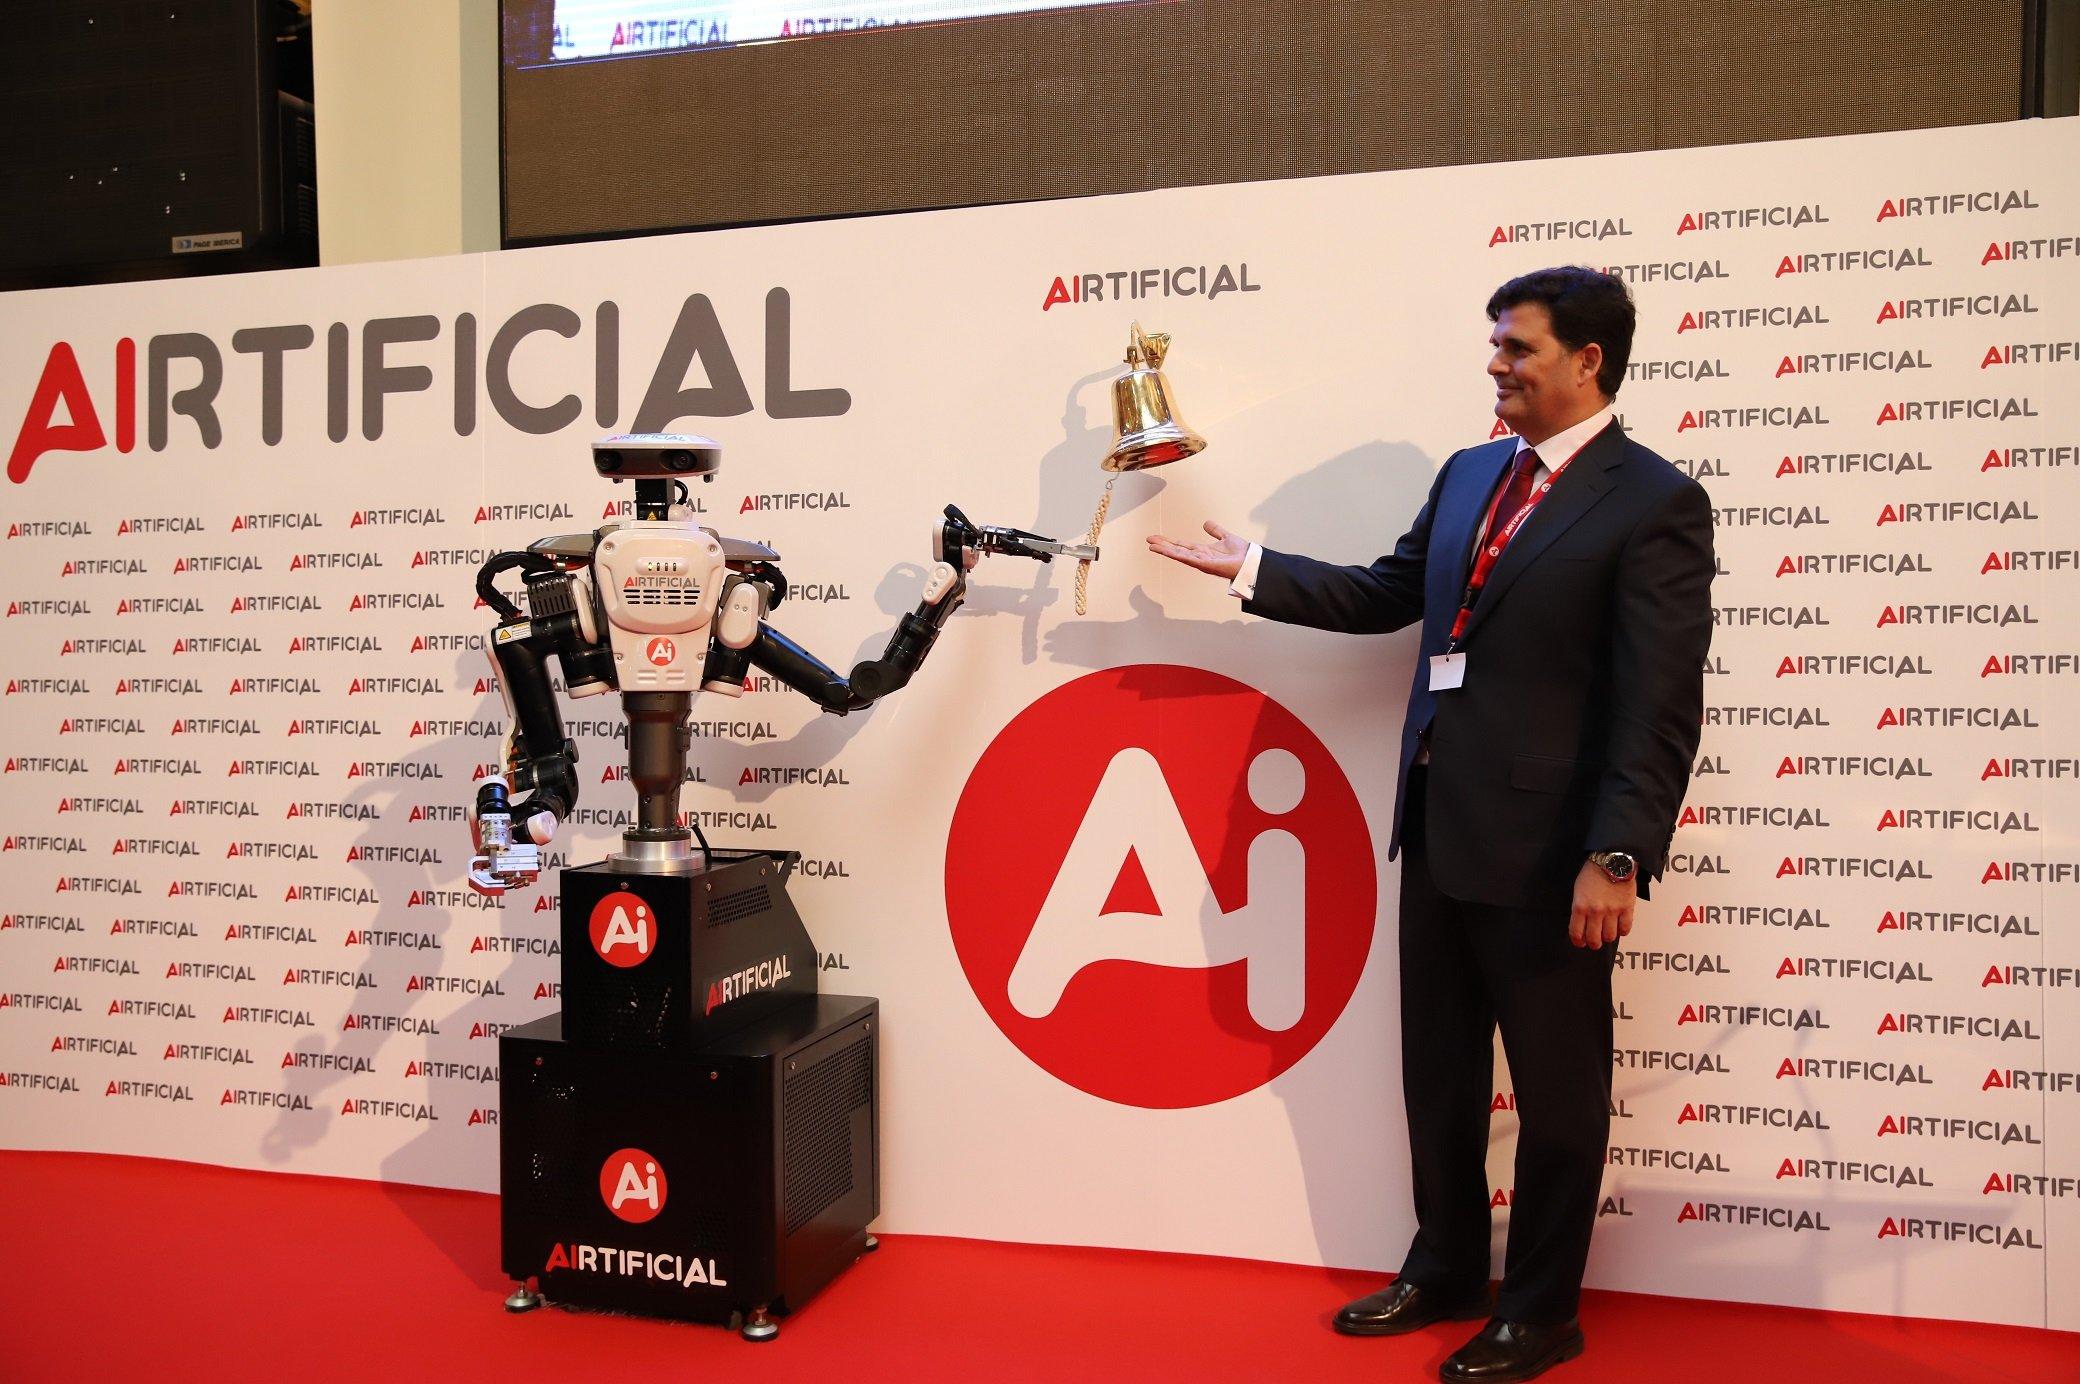 El robot de Airtificial toca la campana en la Bolsa de Madrid